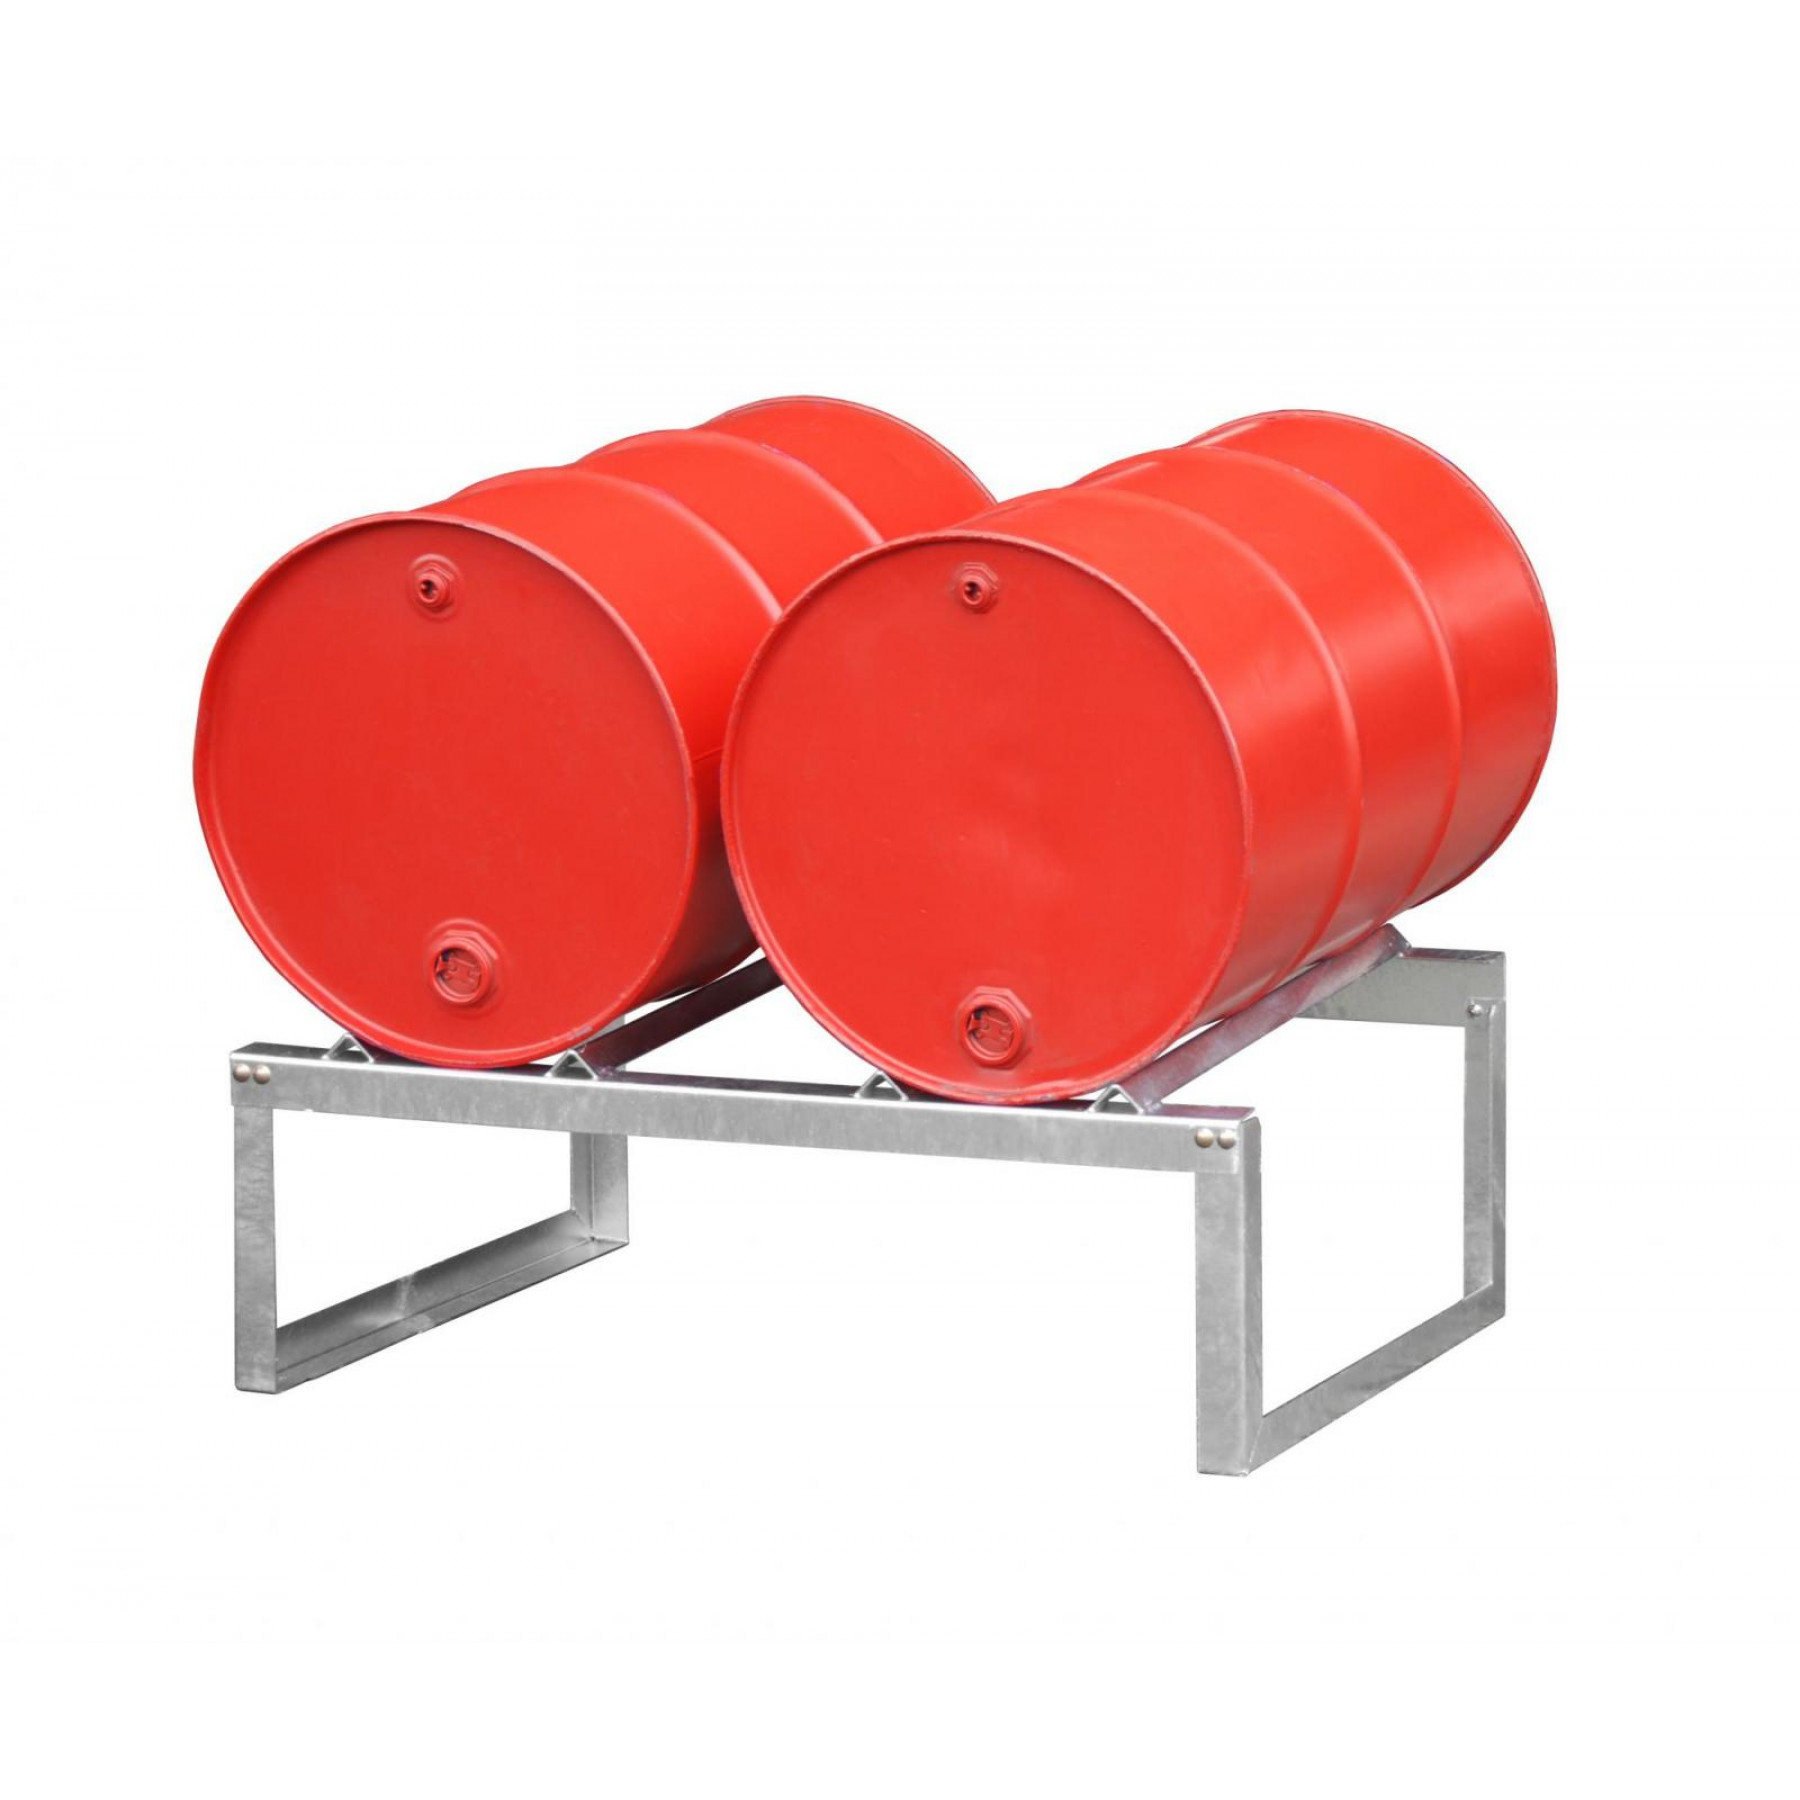 Vatenrek t.b.v. 2 x 200 liter vaten, verzinkt, 70049-FA200-2